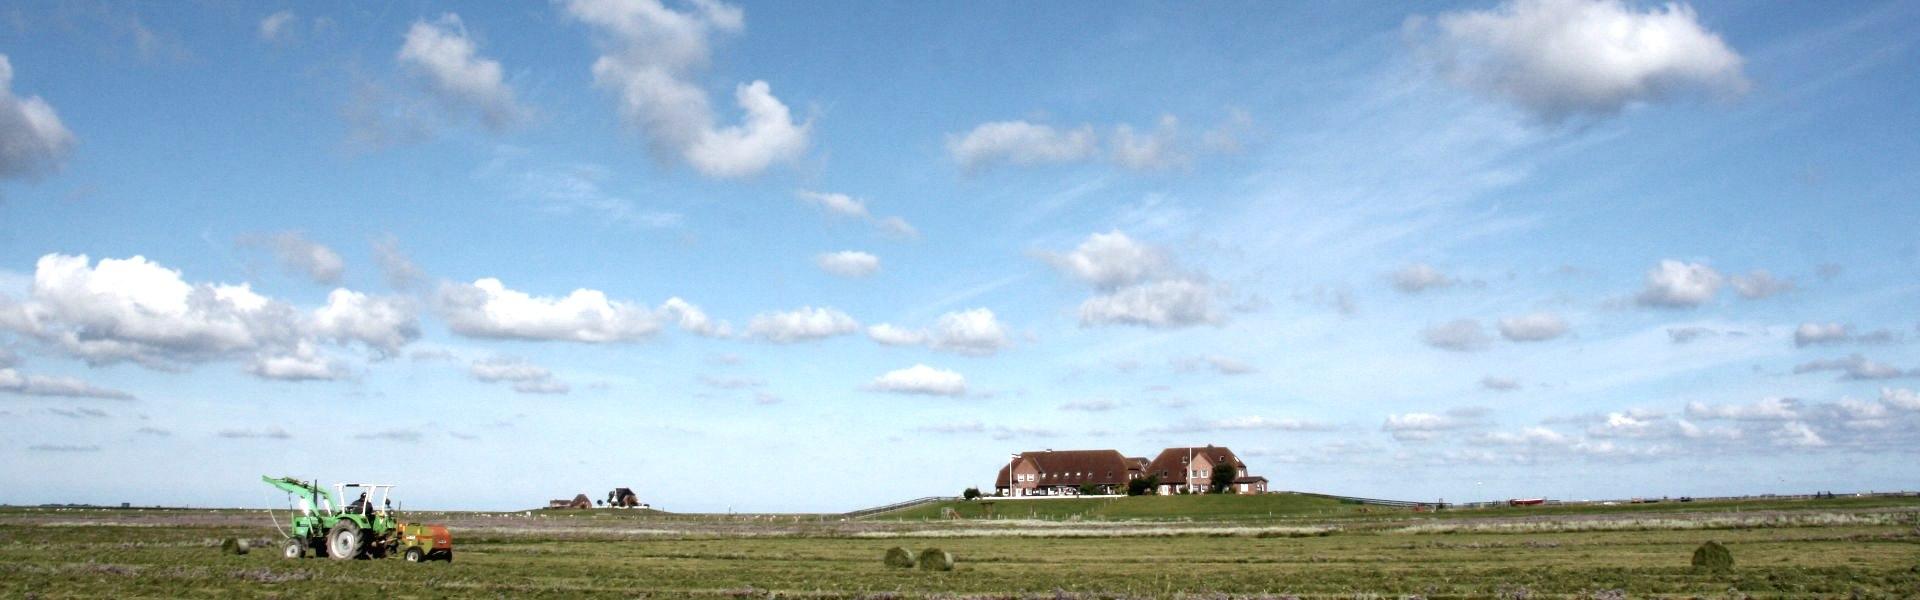 Bauernhof Nordstr.Moor, © Ruth Hartwig-Kruse